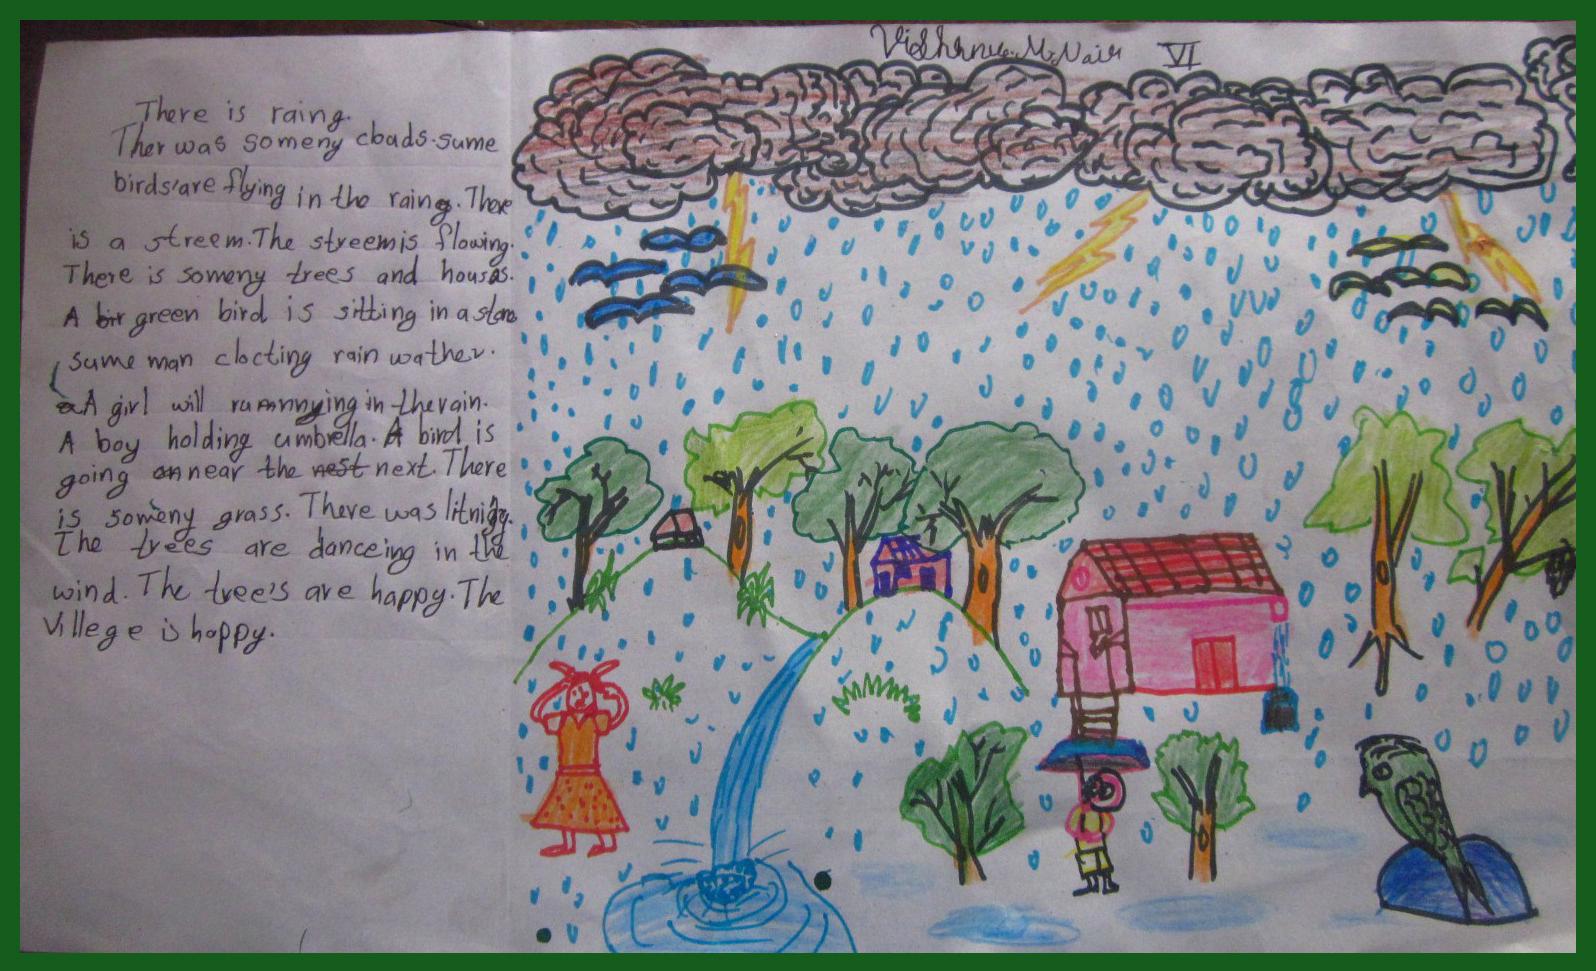 1596x971 A Rainy Day